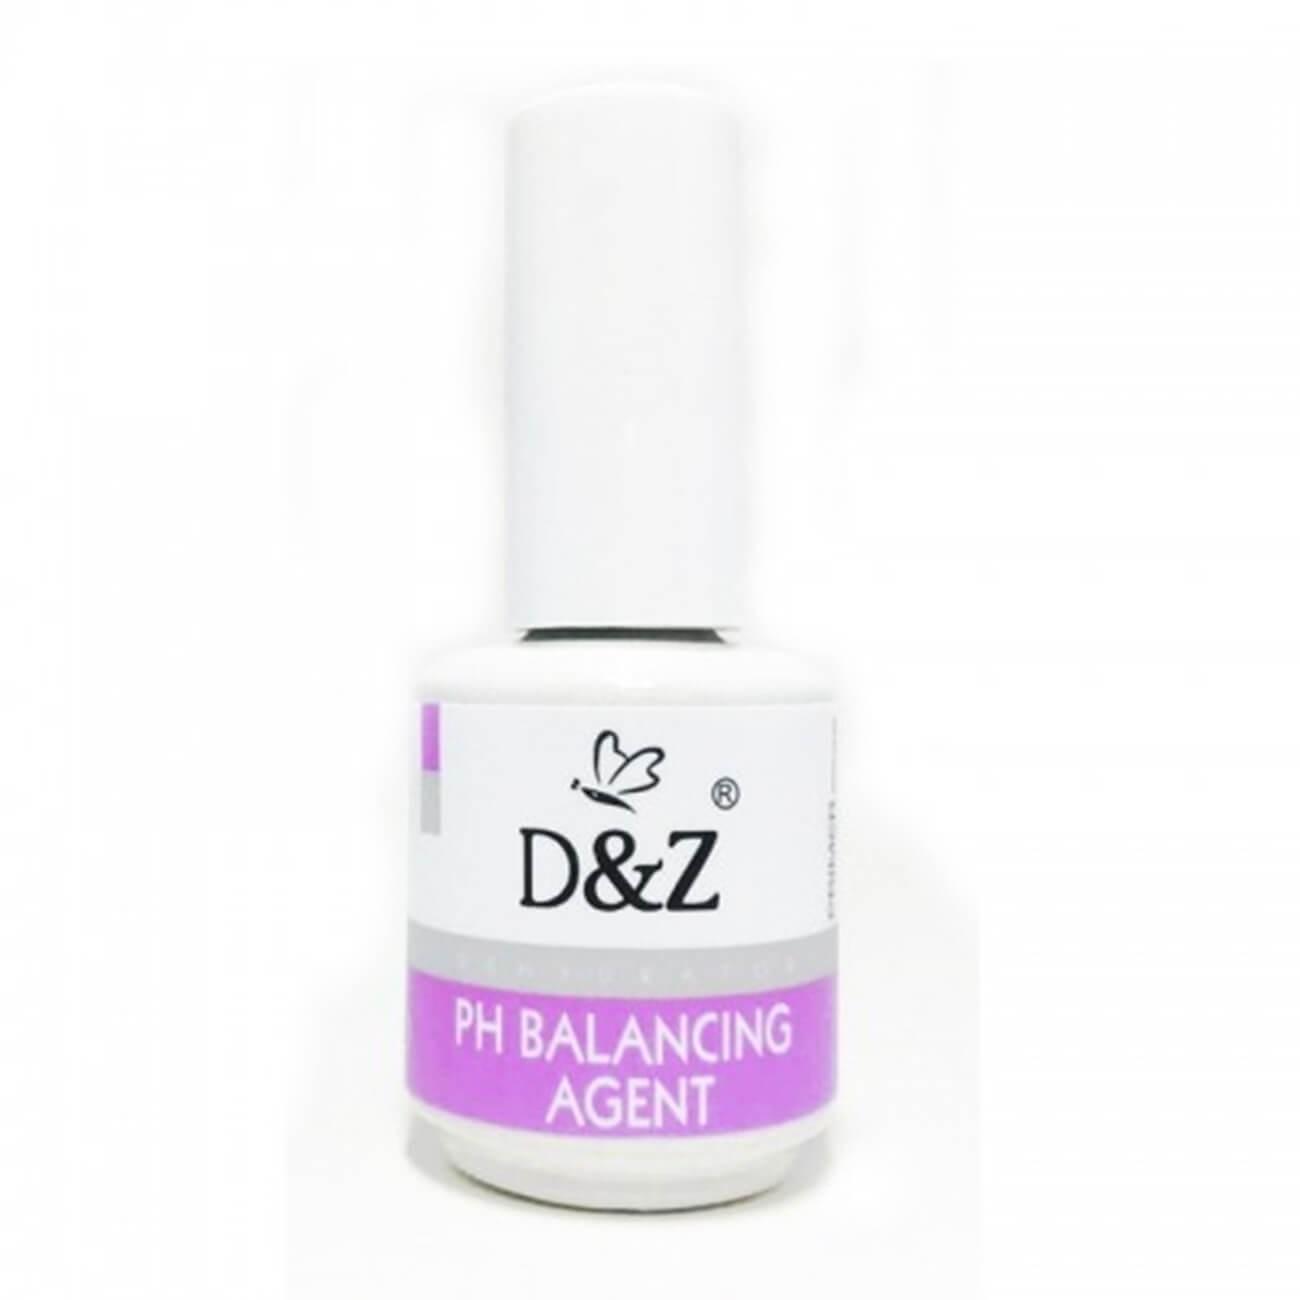 Ph Balancing Agent  - D&Z